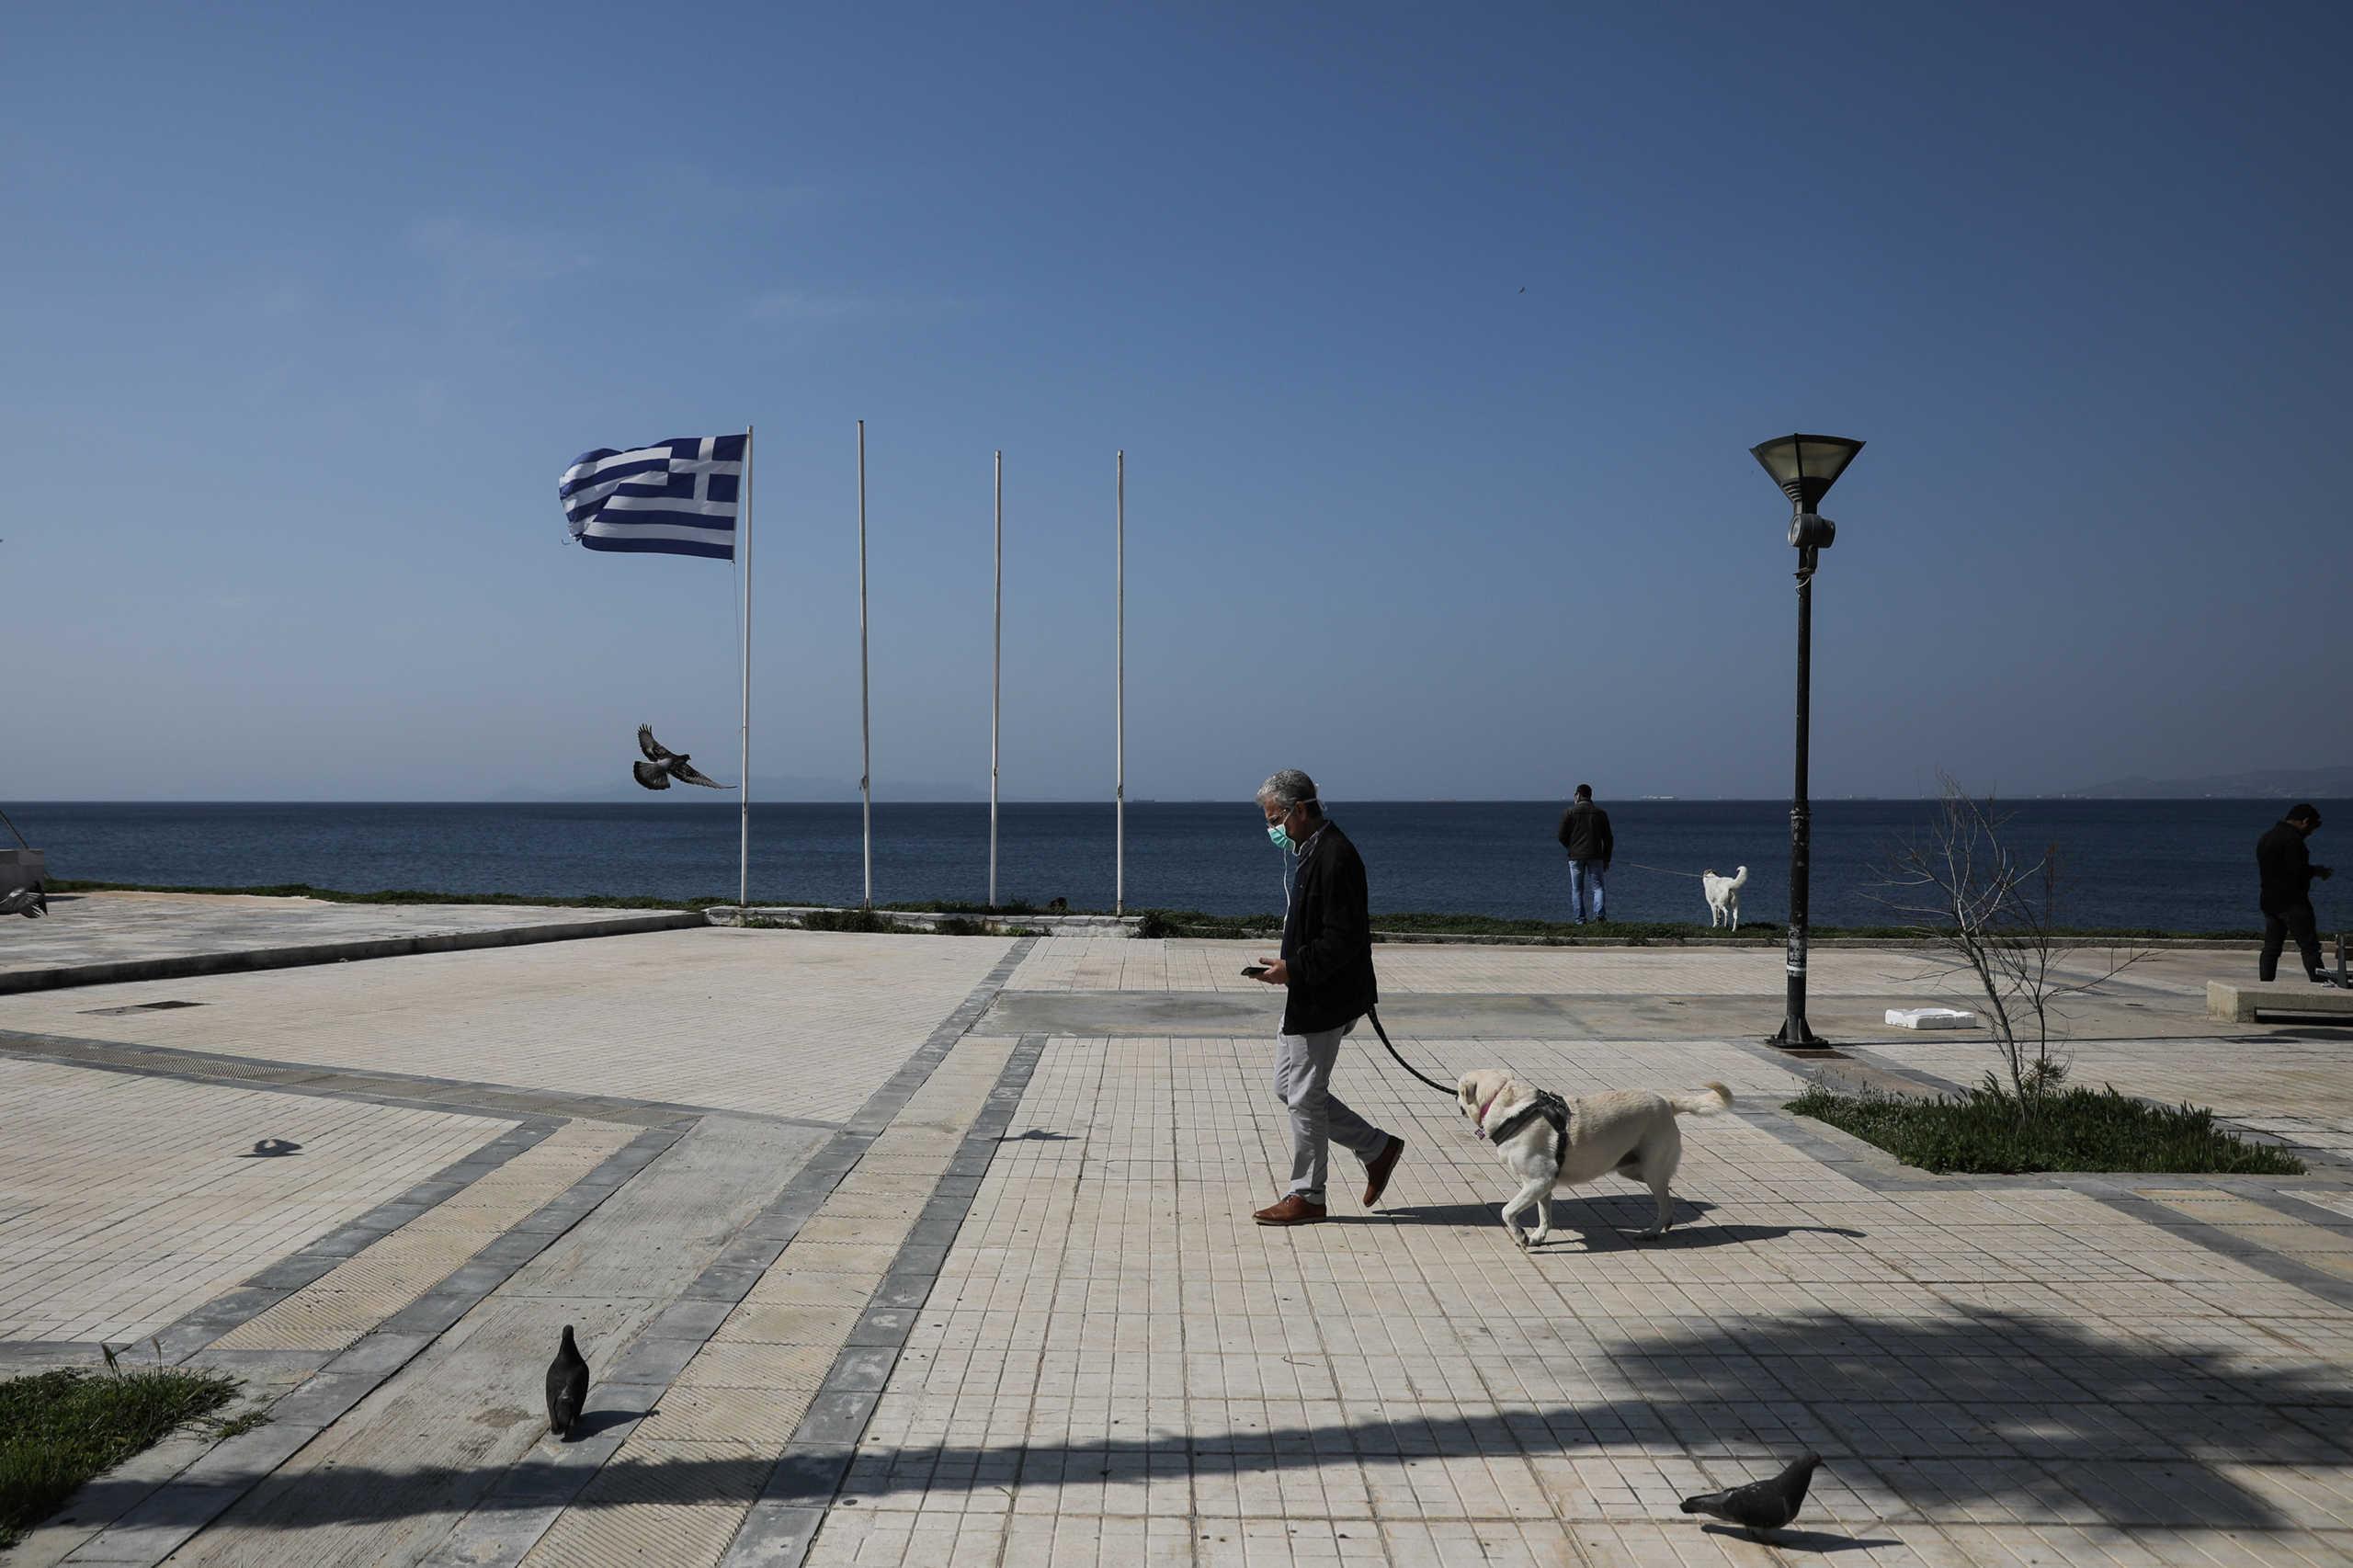 Bloomberg για κορονοϊό: Δούλεψαν τα μέτρα στην Ελλάδα